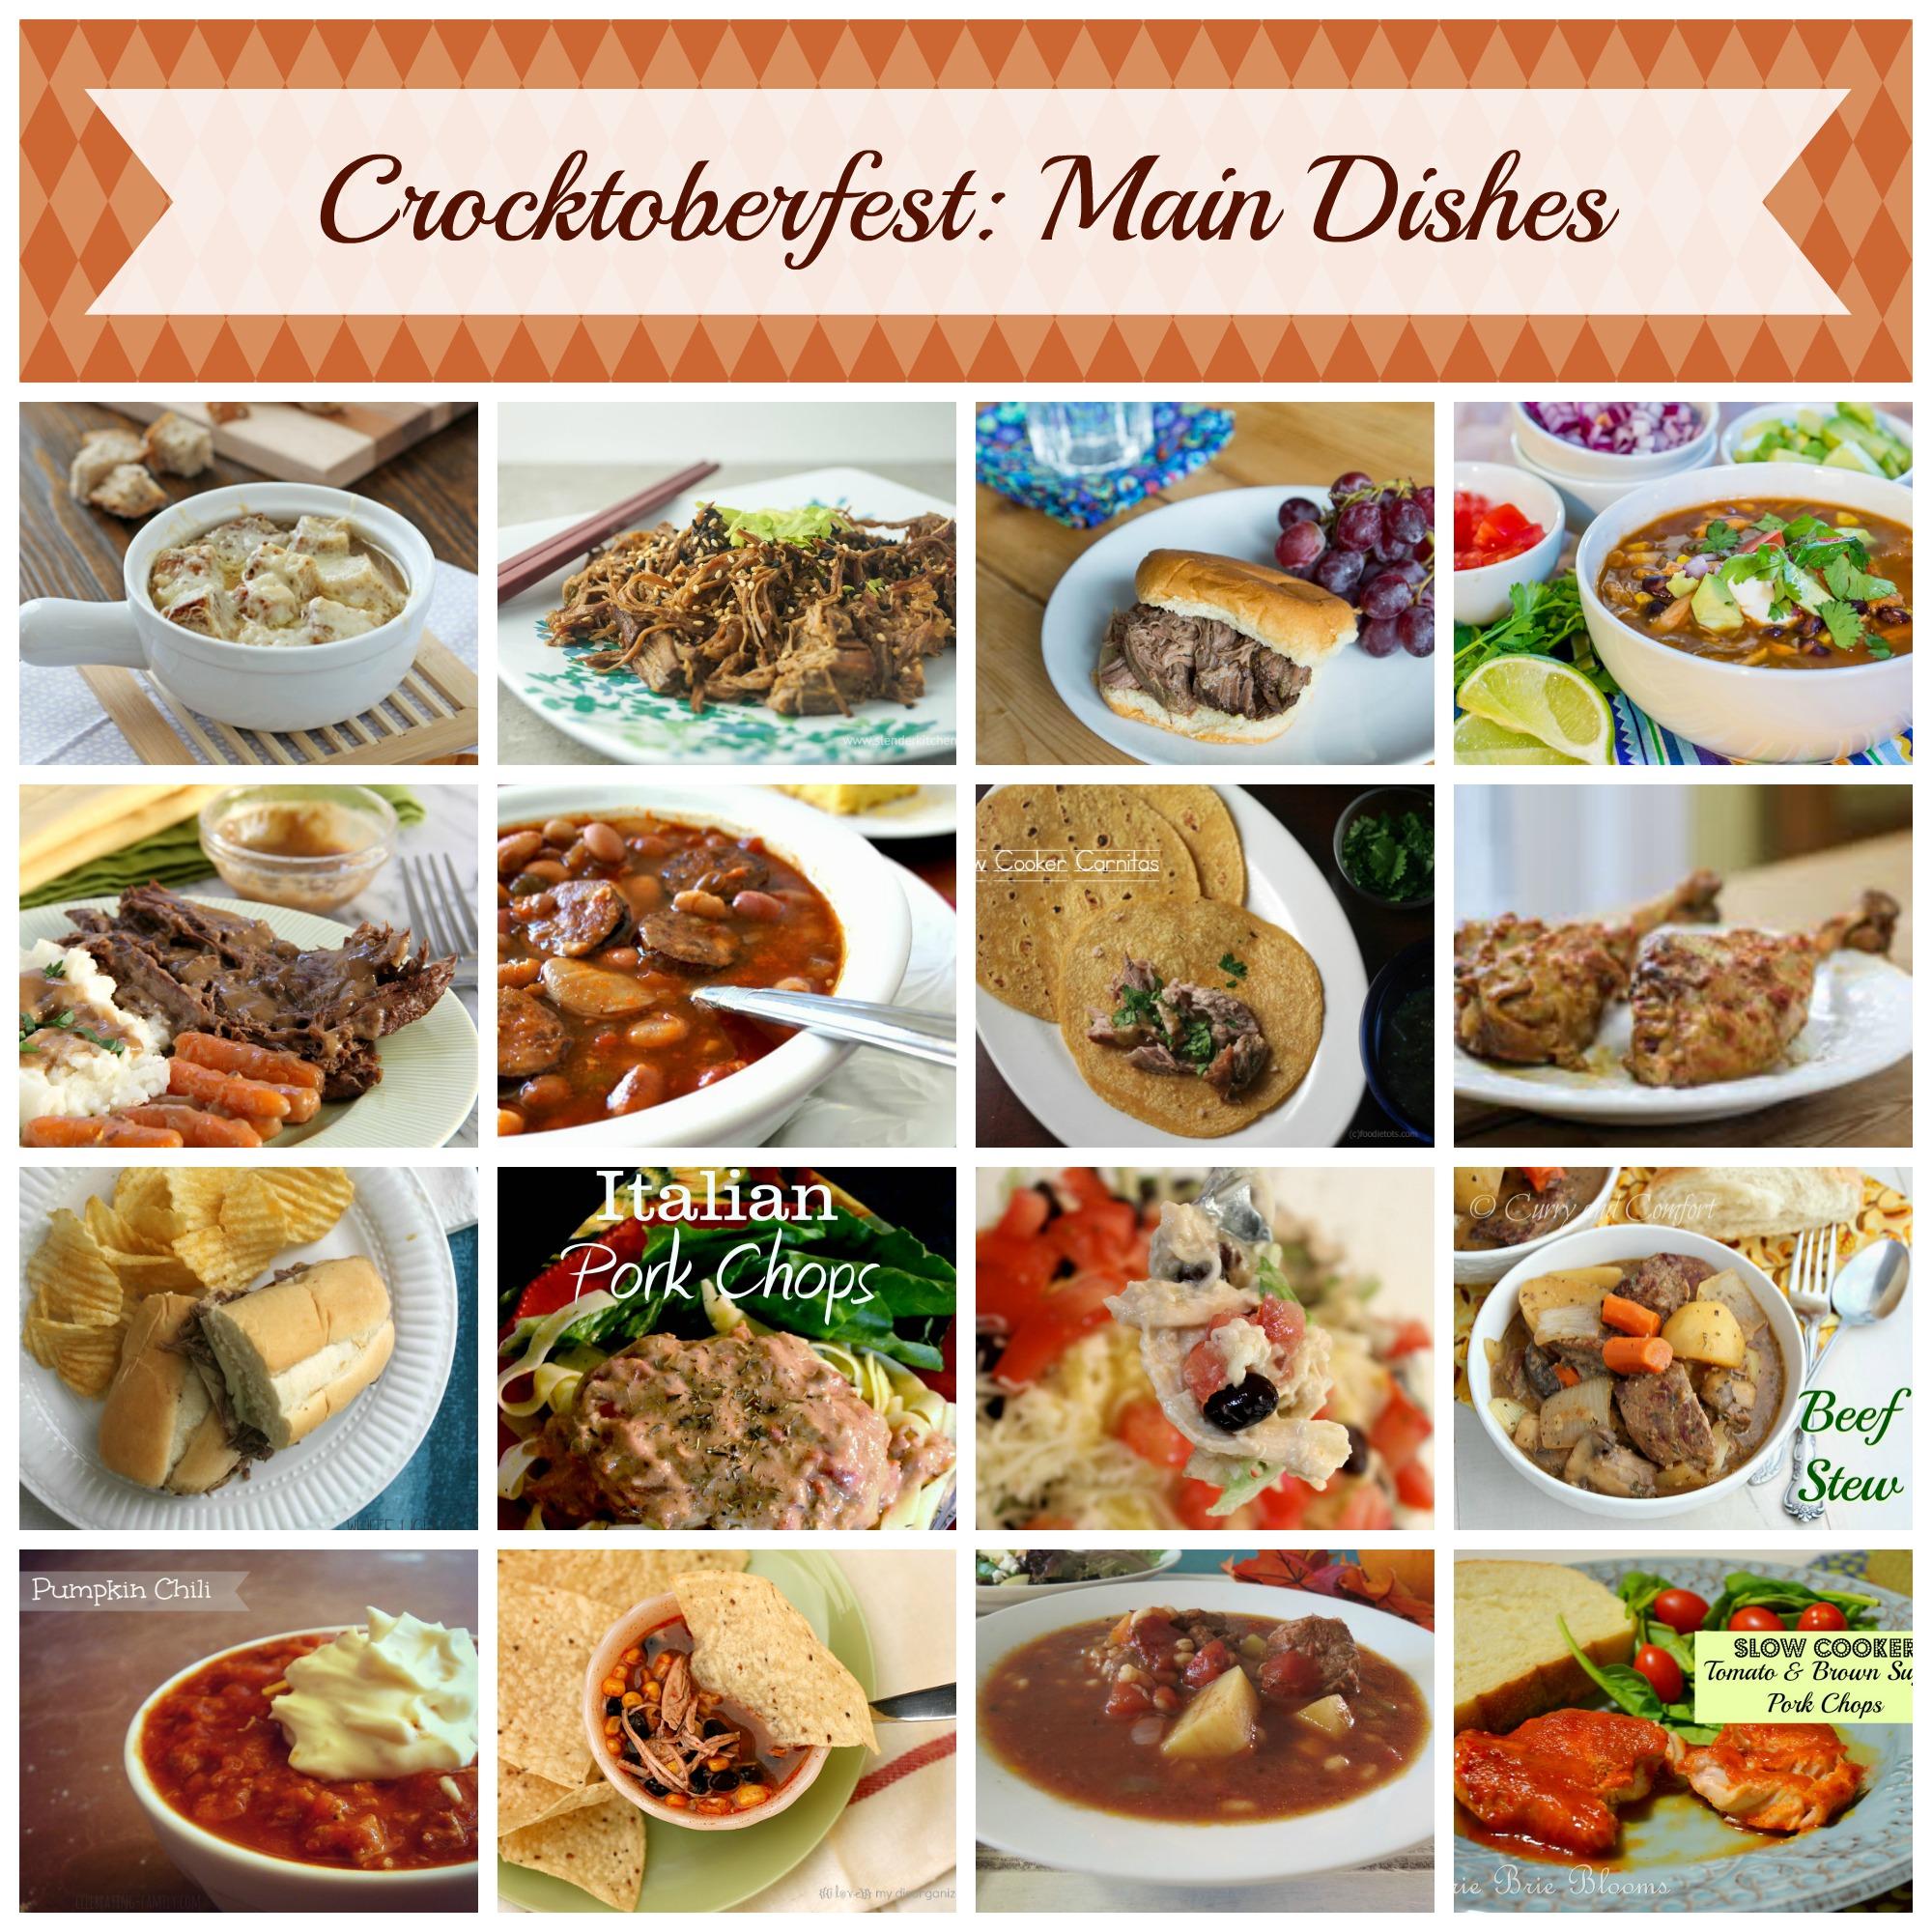 Slow Cooker Recipes #Crocktoberfest2013